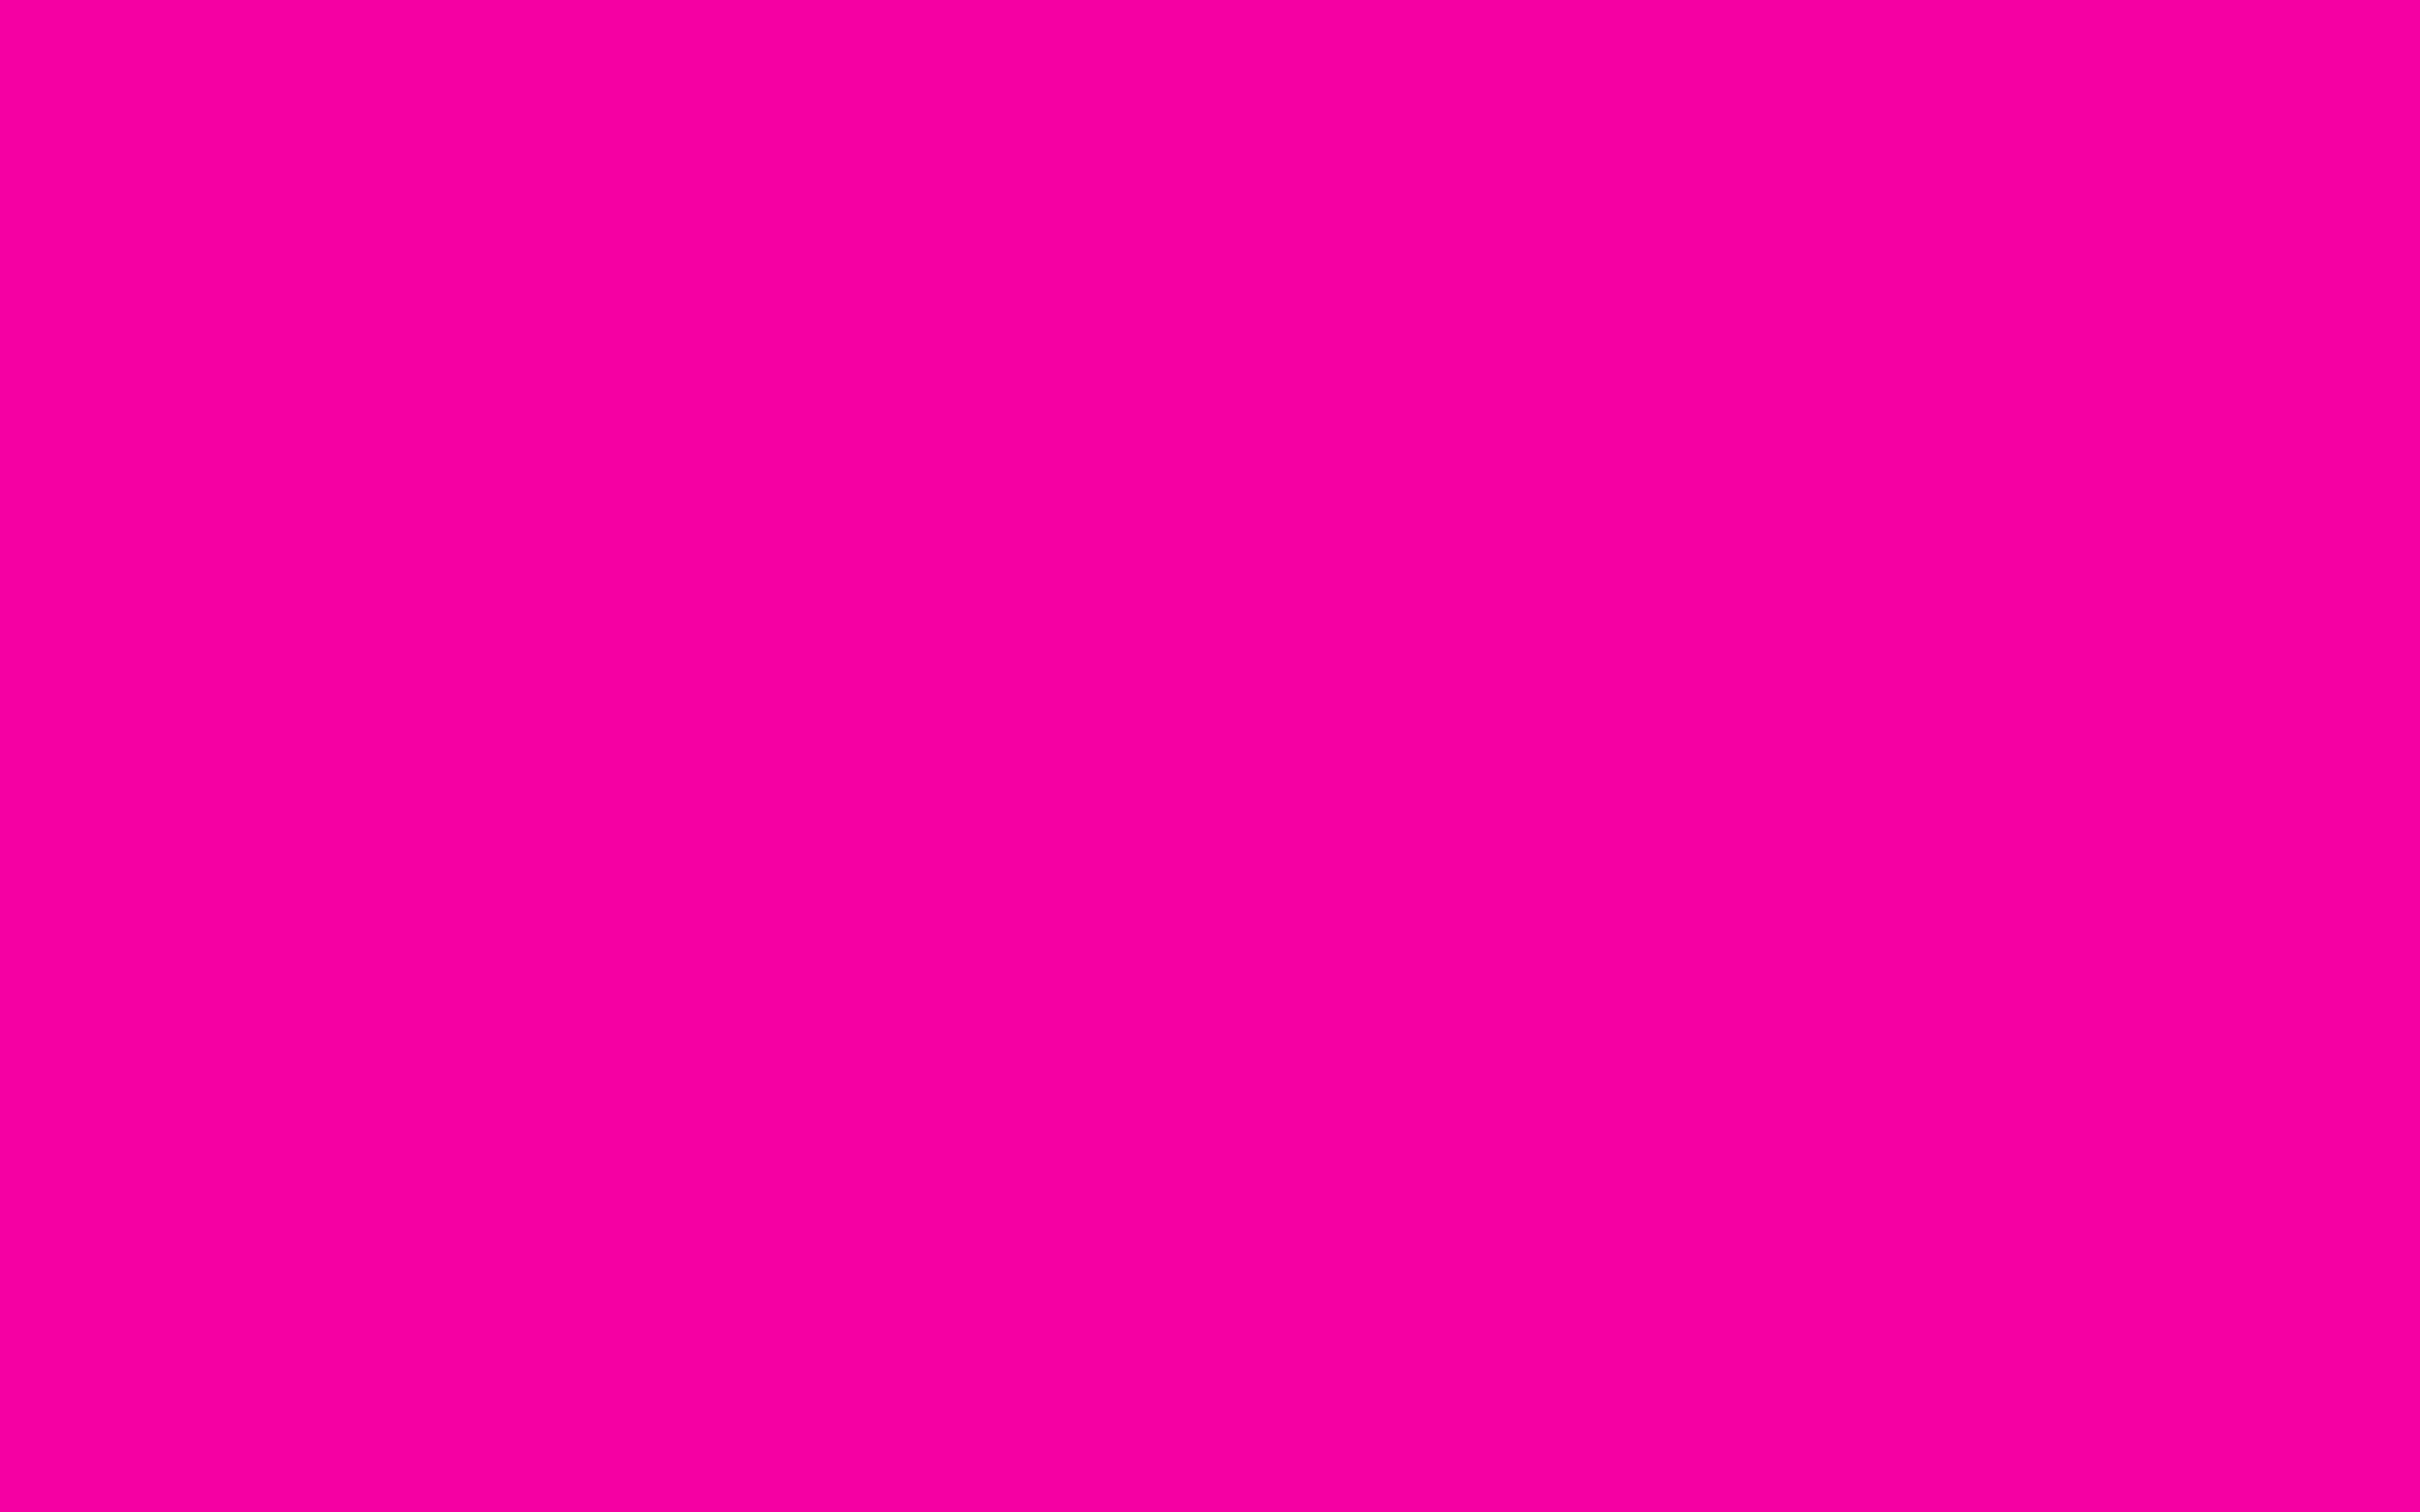 2560x1600 Fashion Fuchsia Solid Color Background